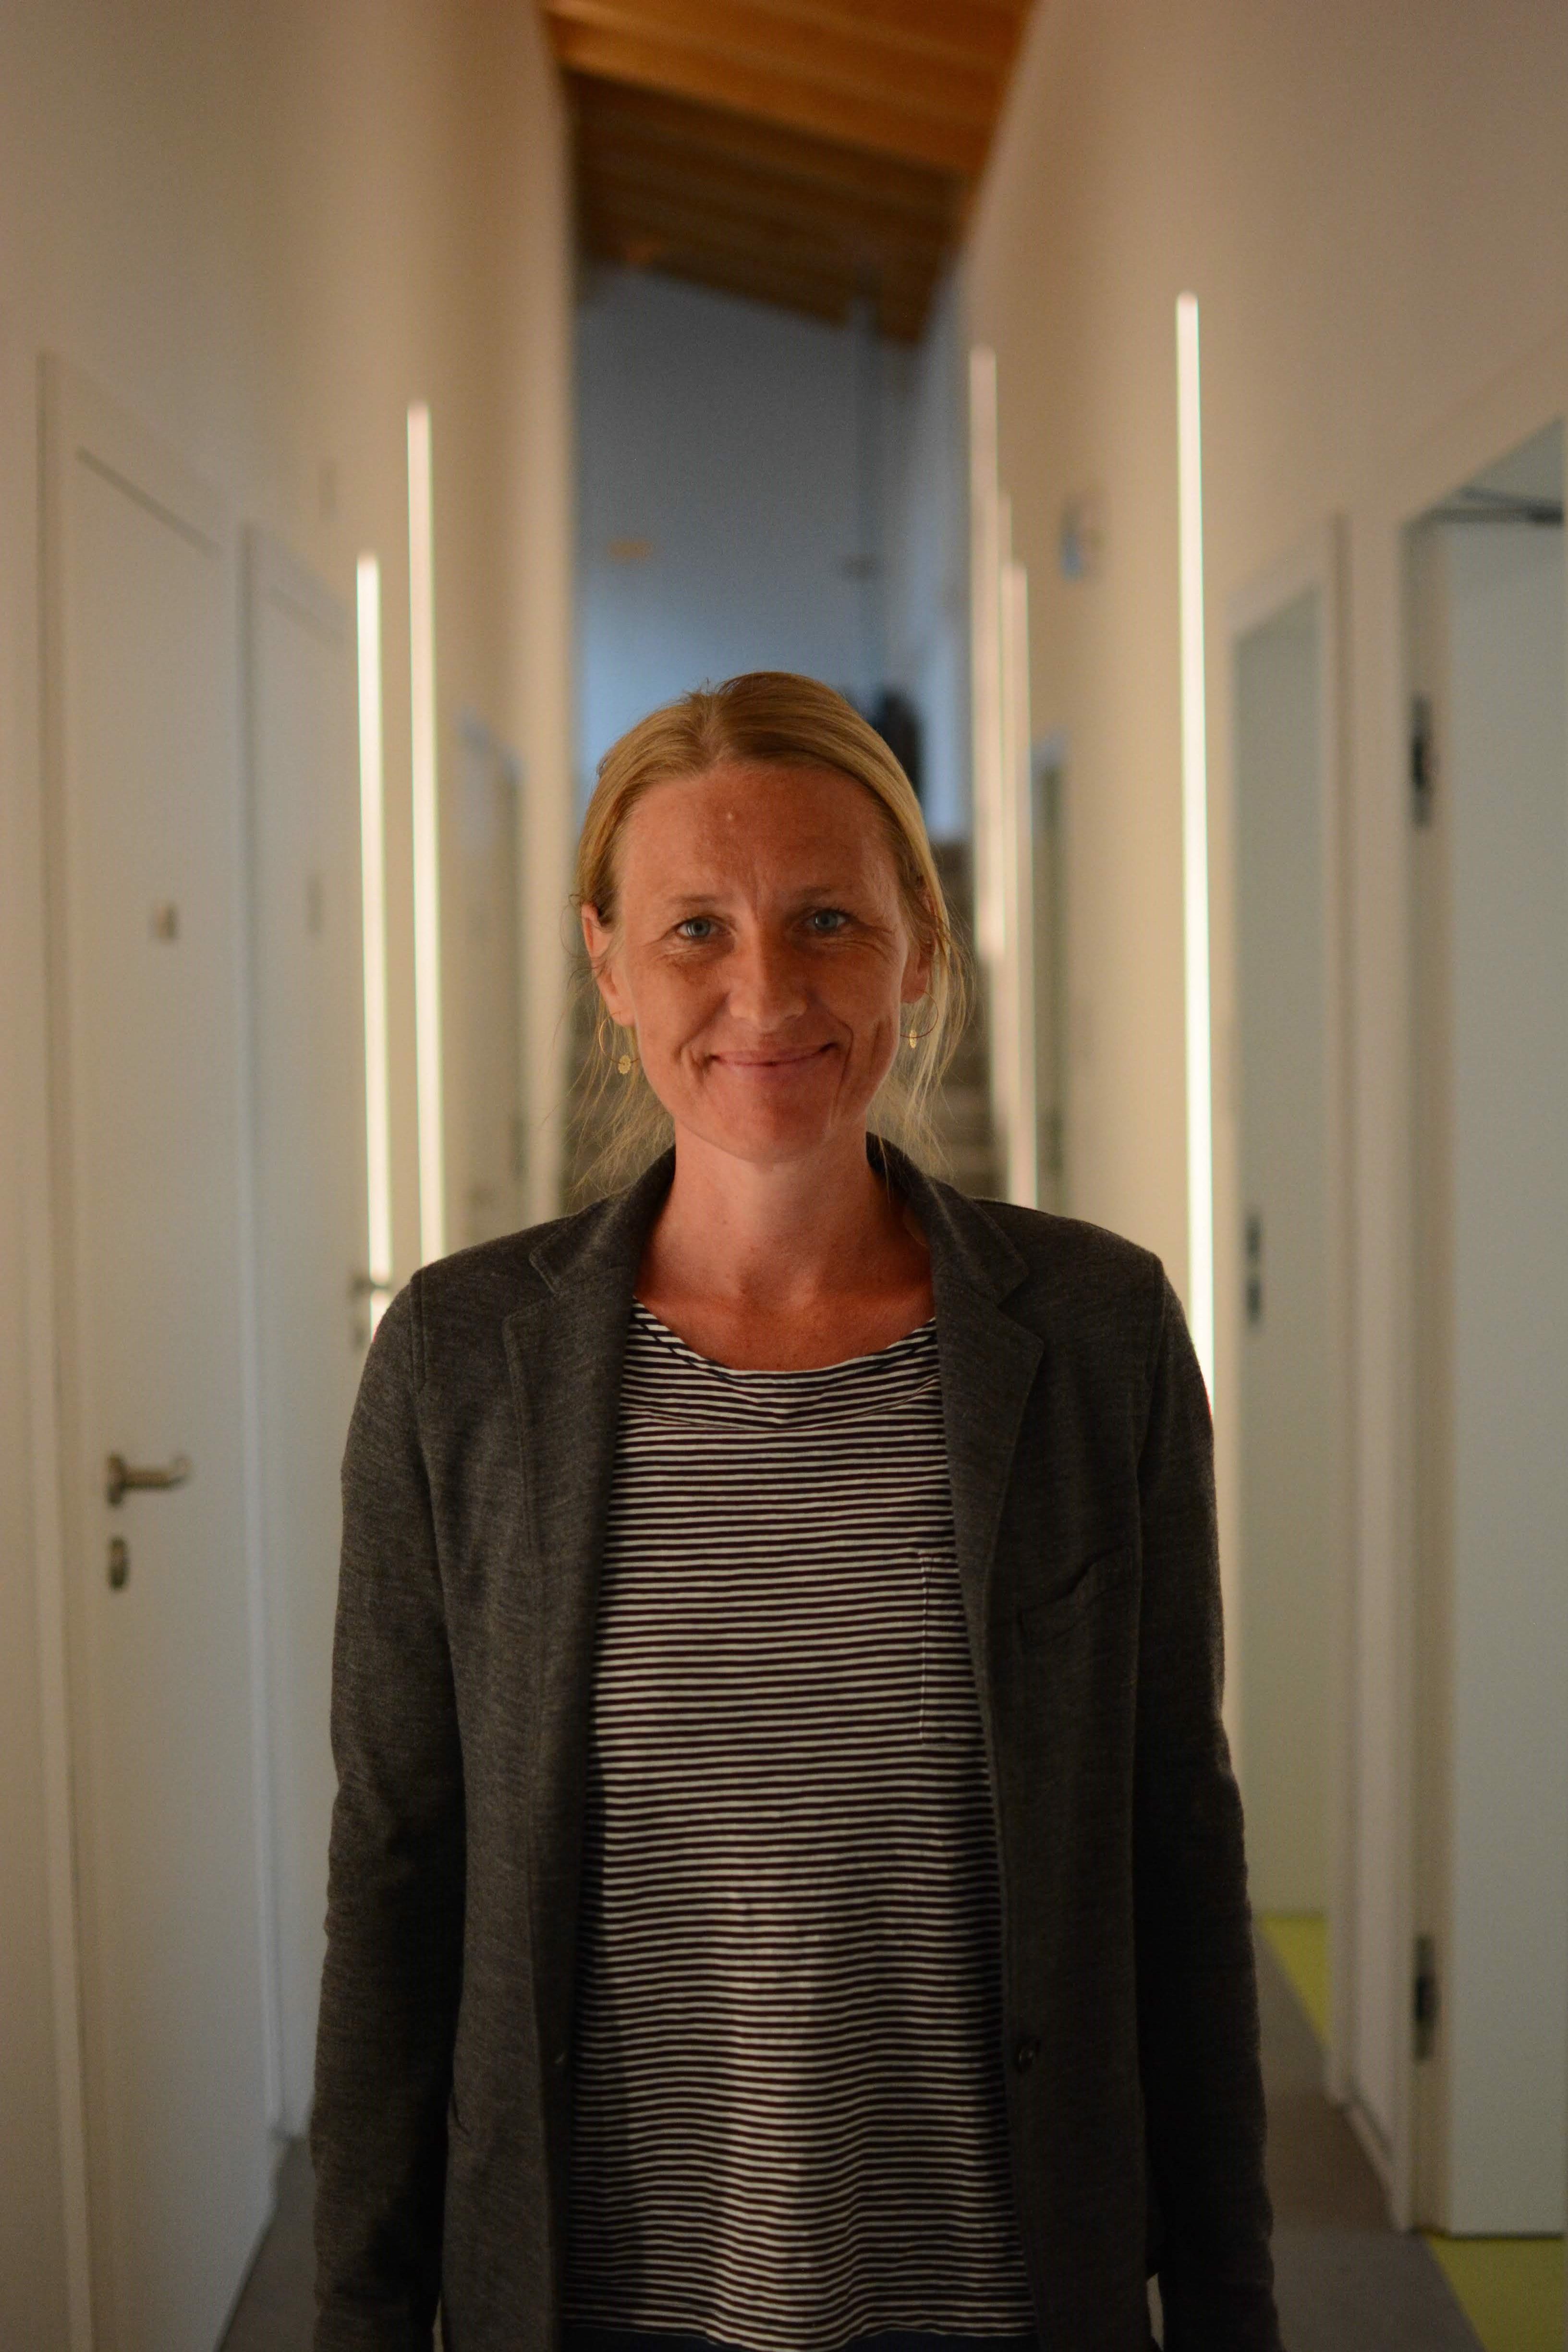 Sigrid Wiesinger